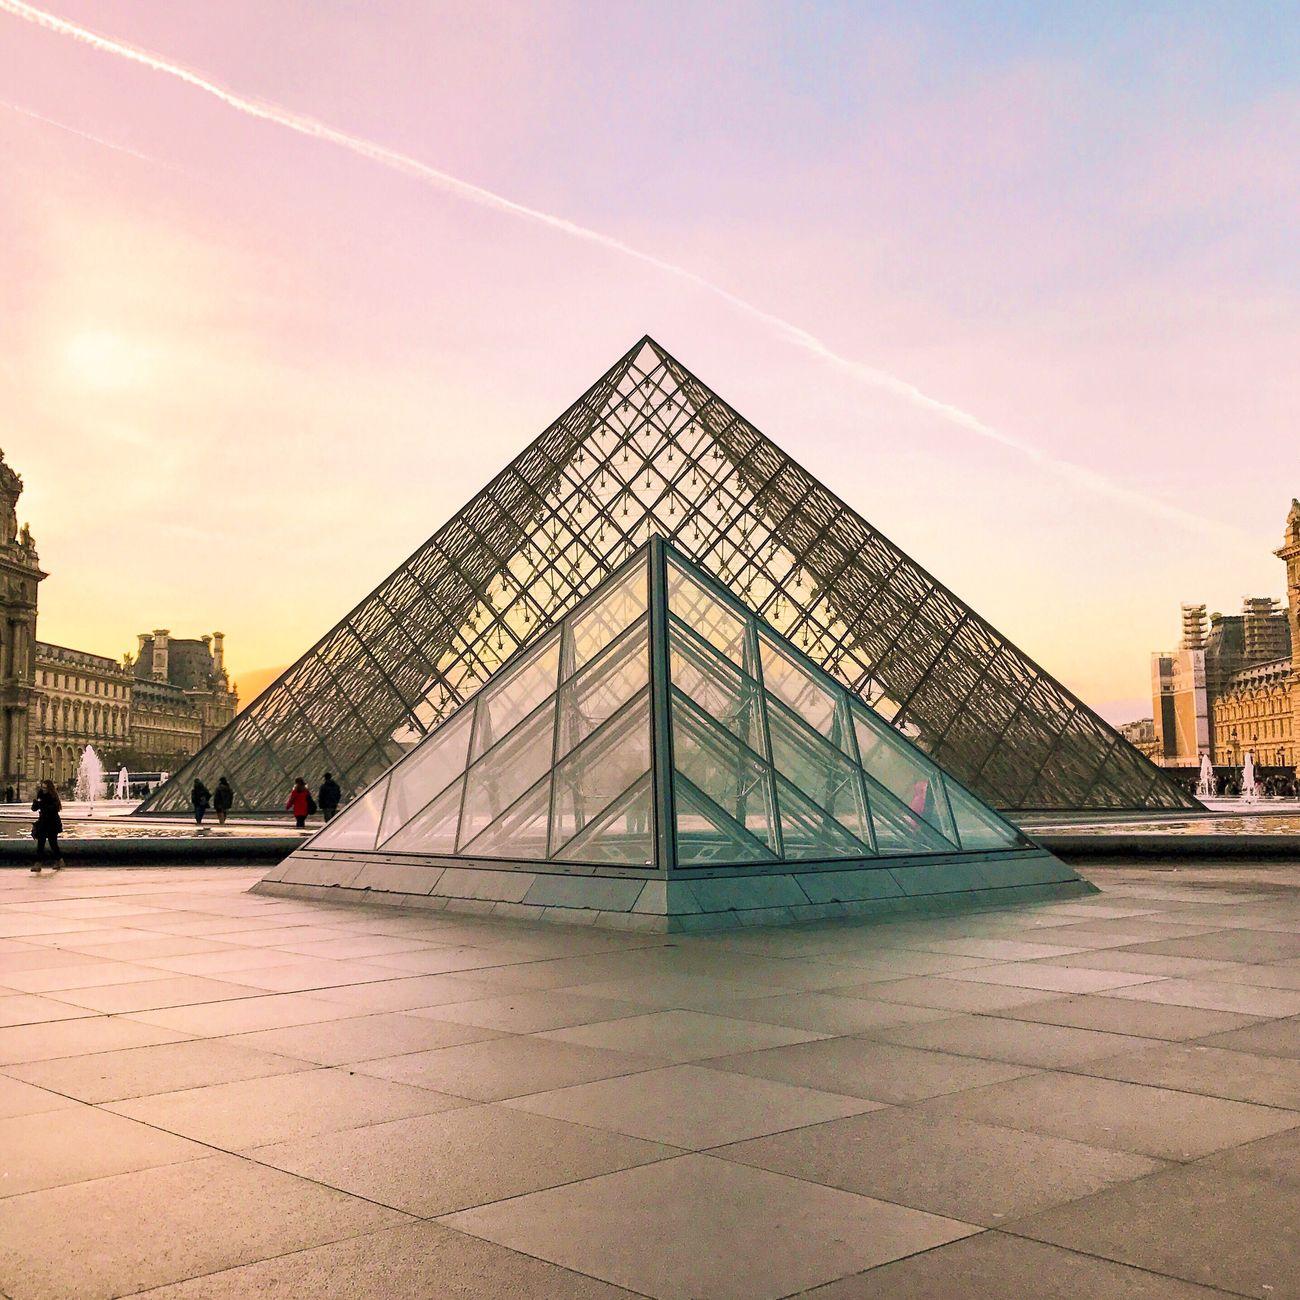 A little bit of color for a grey day! Bonjour Paris! Architecture Built Structure Sky Sunset Pyramid Parisweloveyou EyeEm Best Shots Eyem Best Shot - Architecture Paris Photooftheday Travel Destinations